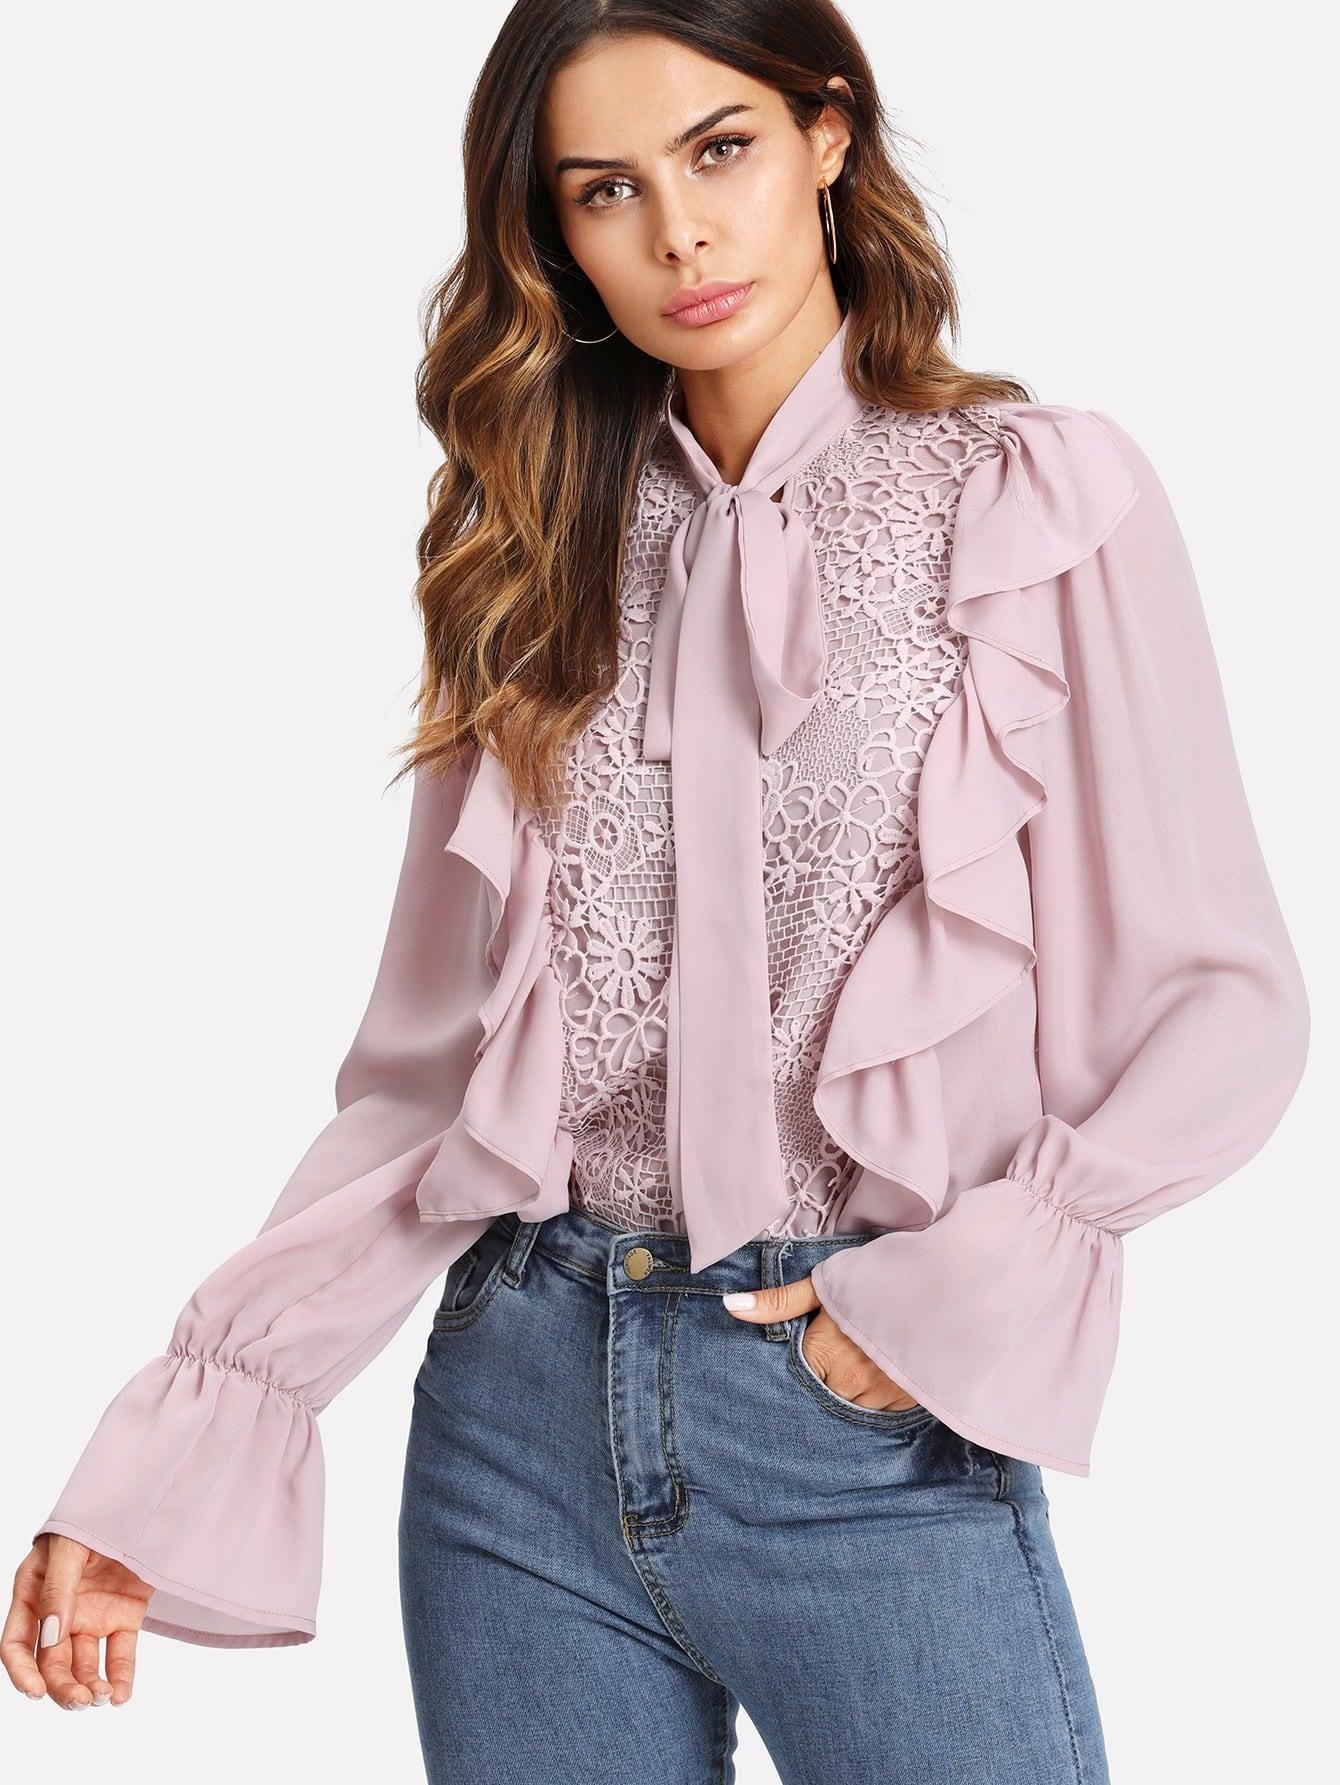 2a3472b7778 Tie Neck Lace Applique Ruffle Blouse EmmaCloth-Women Fast Fashion Online